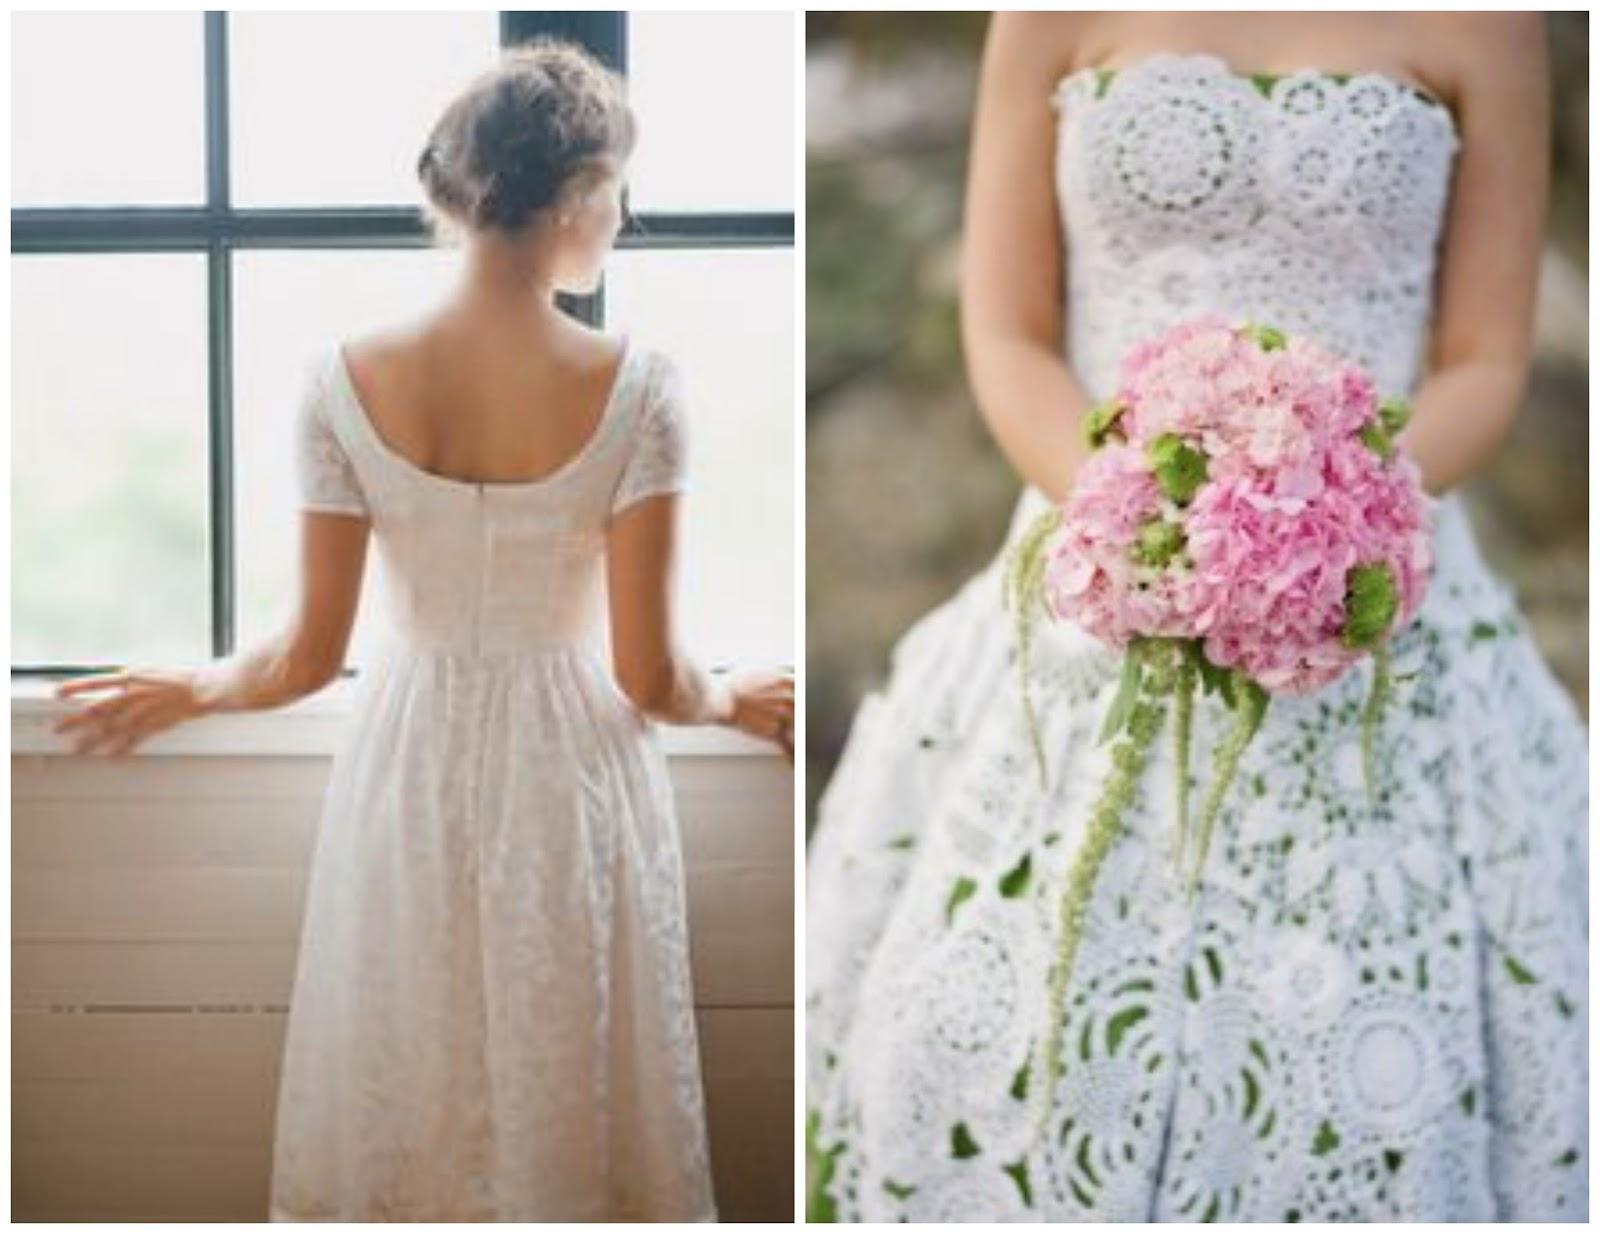 handmade wedding dresses - mother of the bride dresses